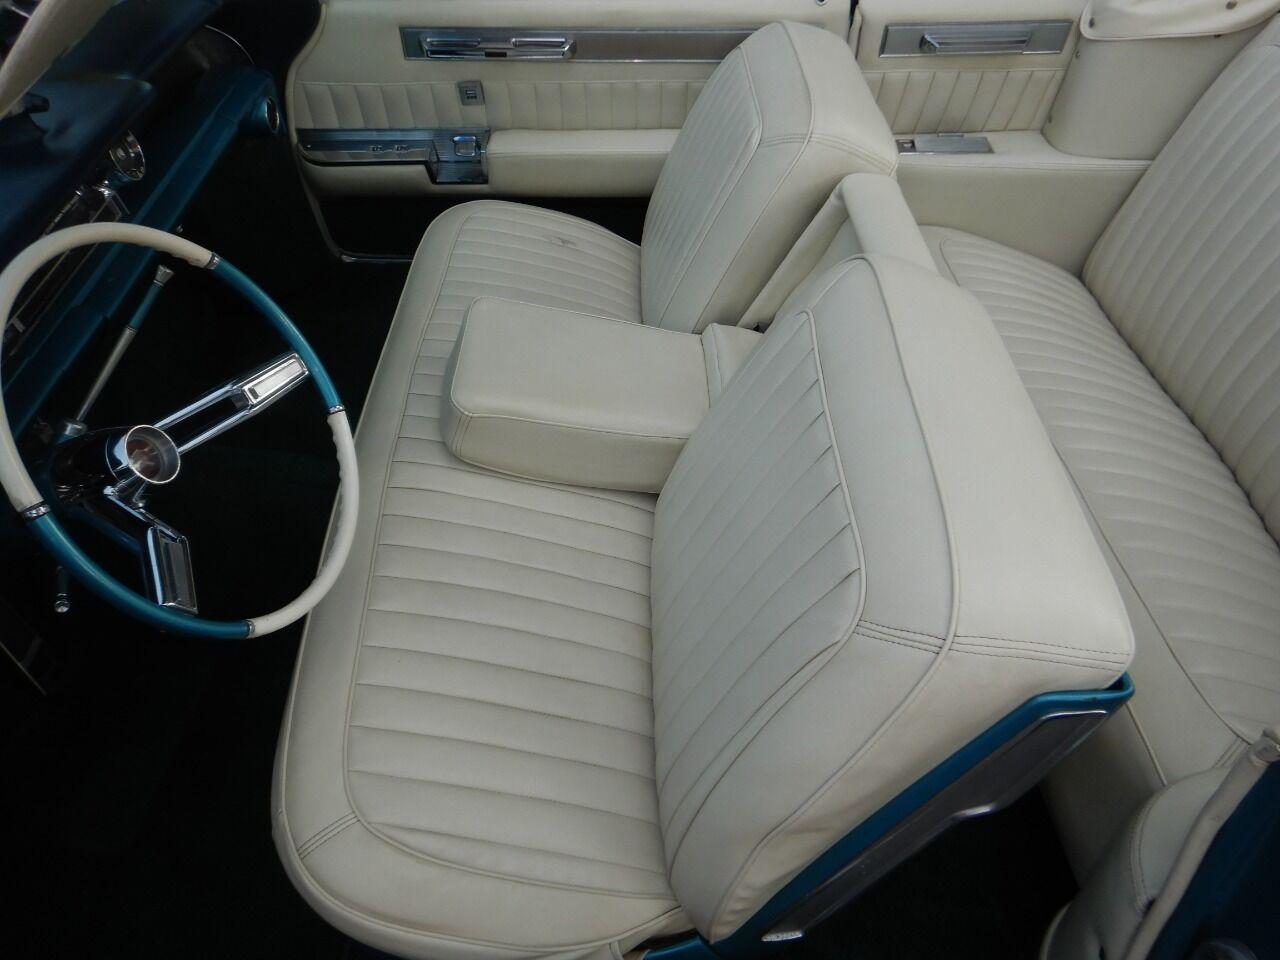 1961 Cadillac Eldorado Biarritz 54